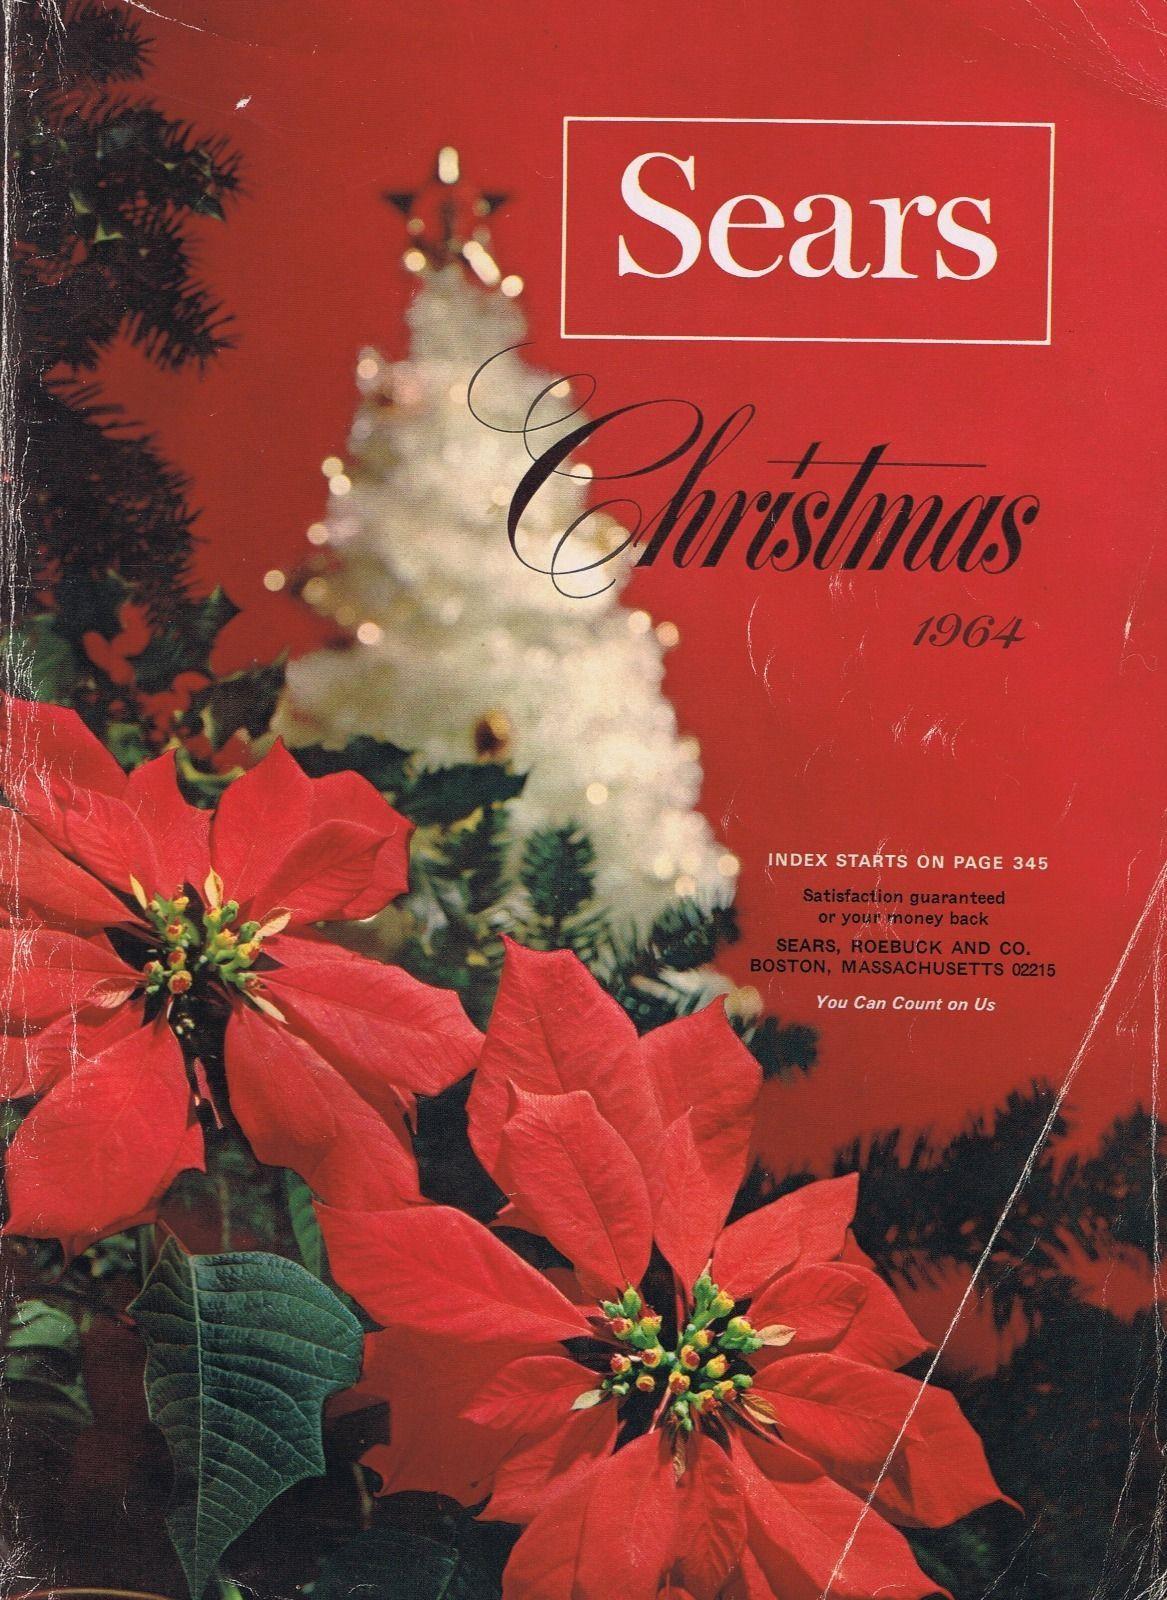 Sears Christmas Wishbook, 1964